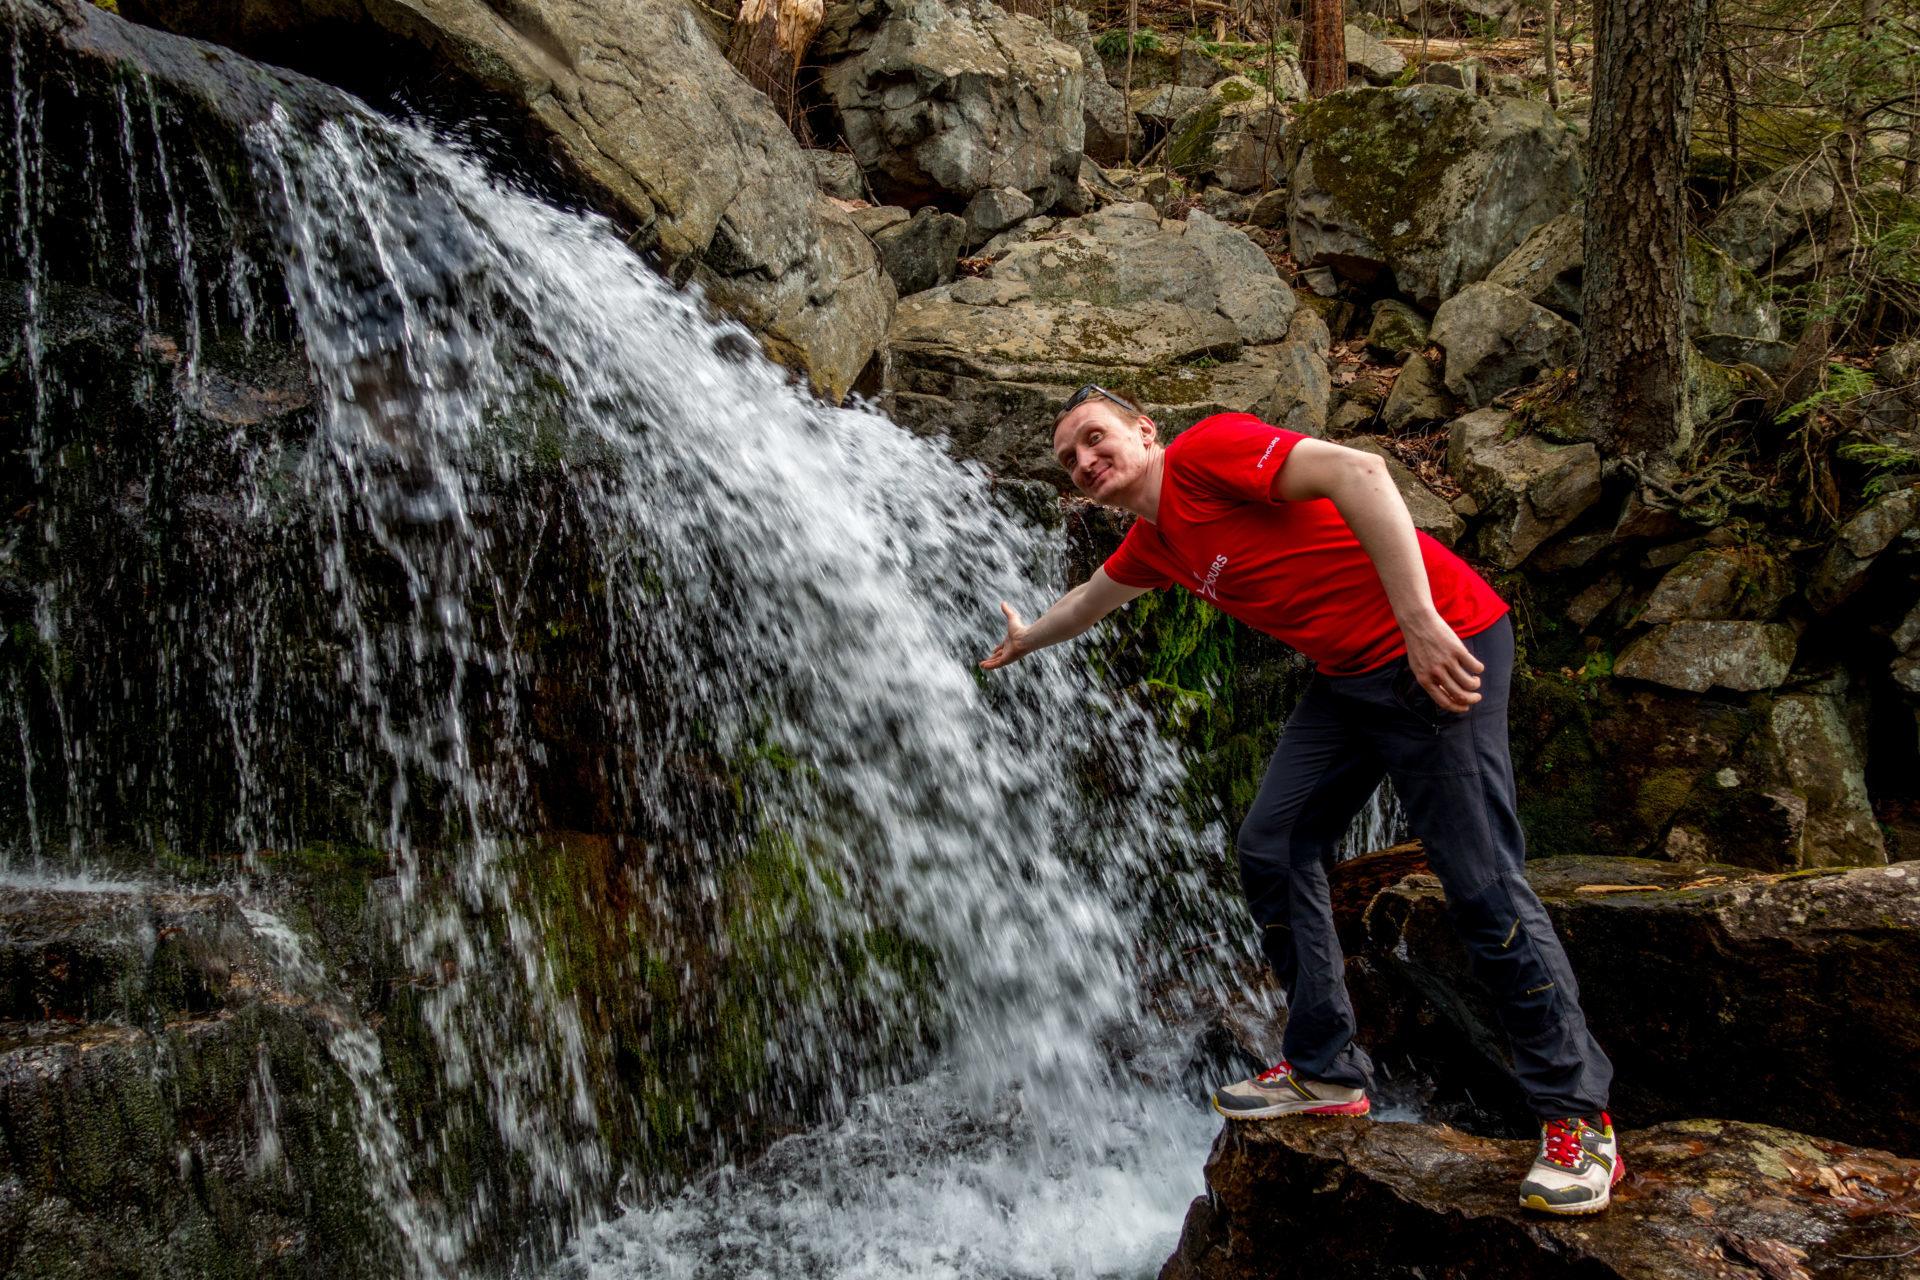 Perica enjoys the waterfall